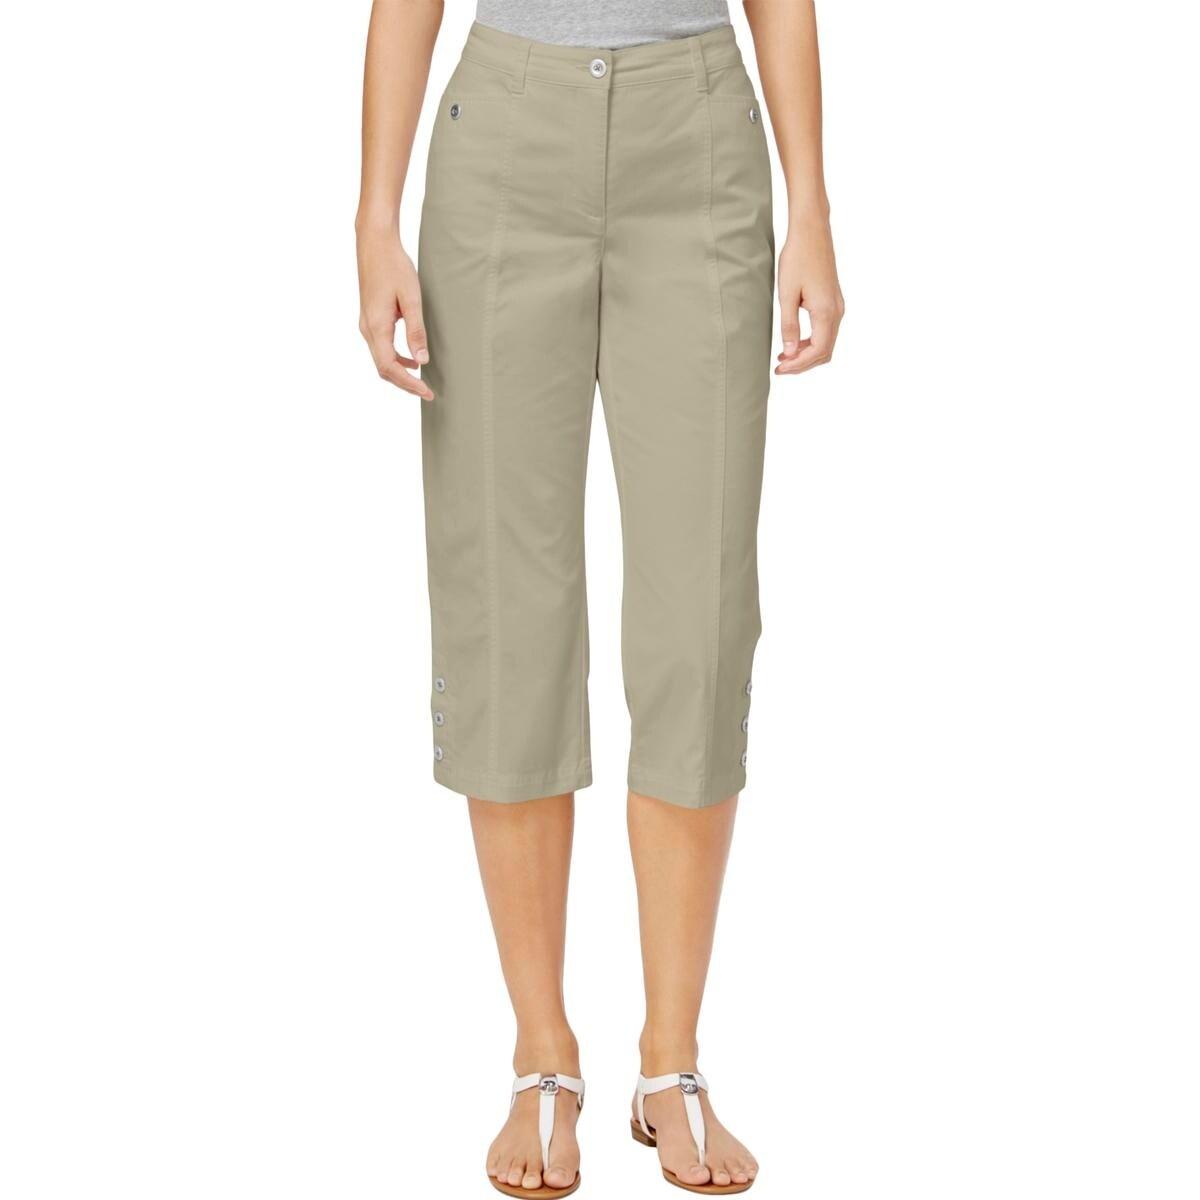 e9e42b6689924 Karen Scott Womens Petites Capri Pants Twill Comfort Waist - Free Shipping  On Orders Over  45 - Overstock - 27561195